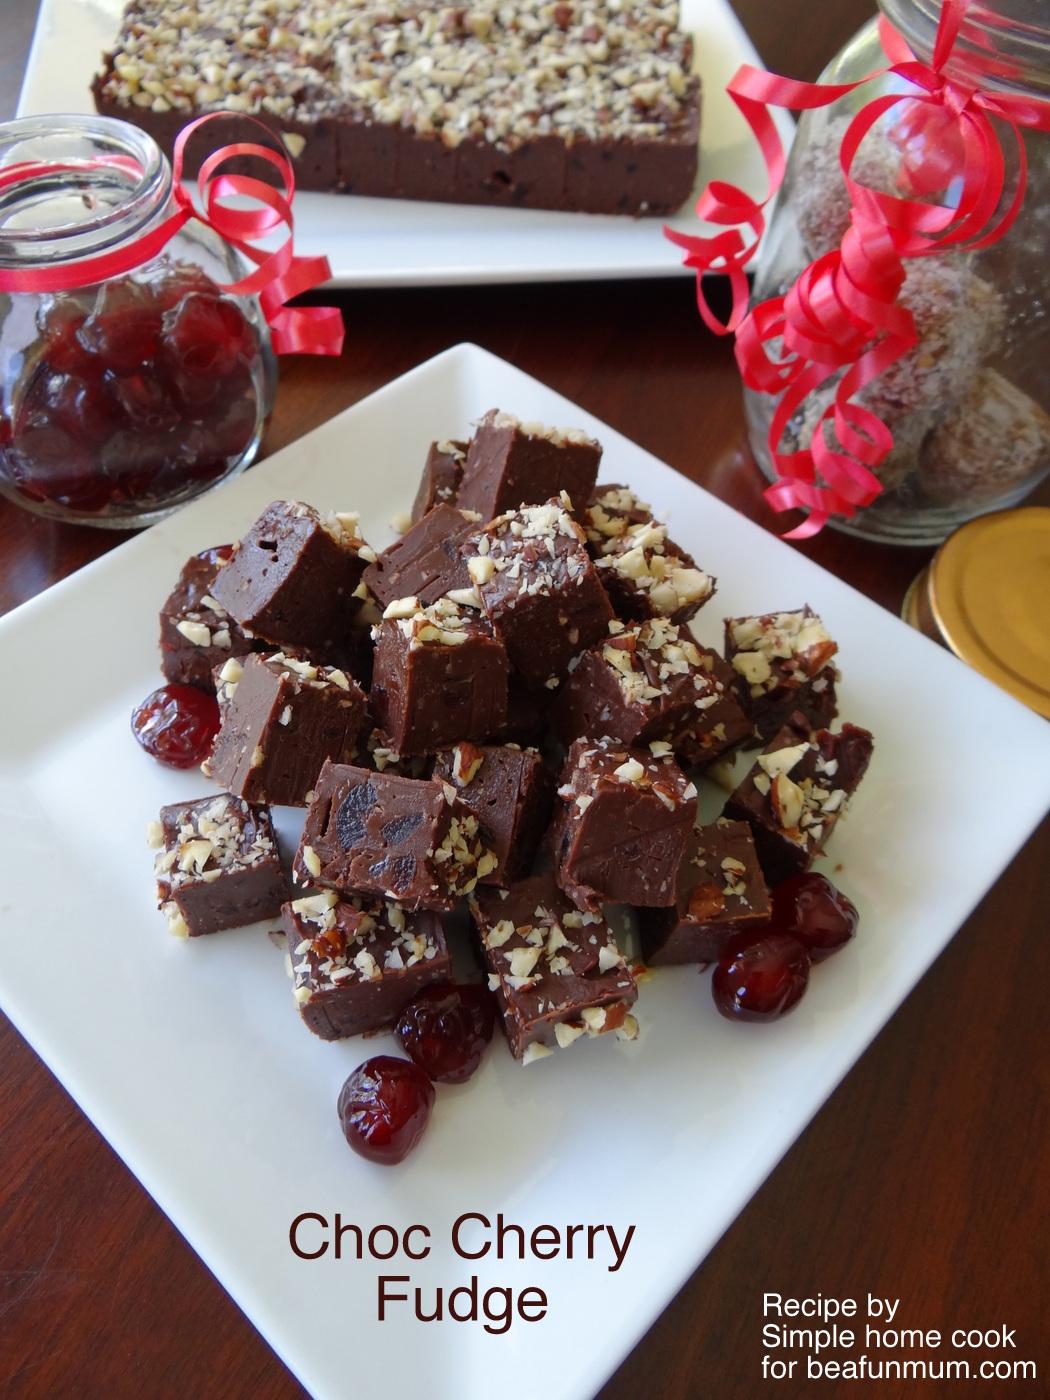 Choc Cherry Fudge Recipe